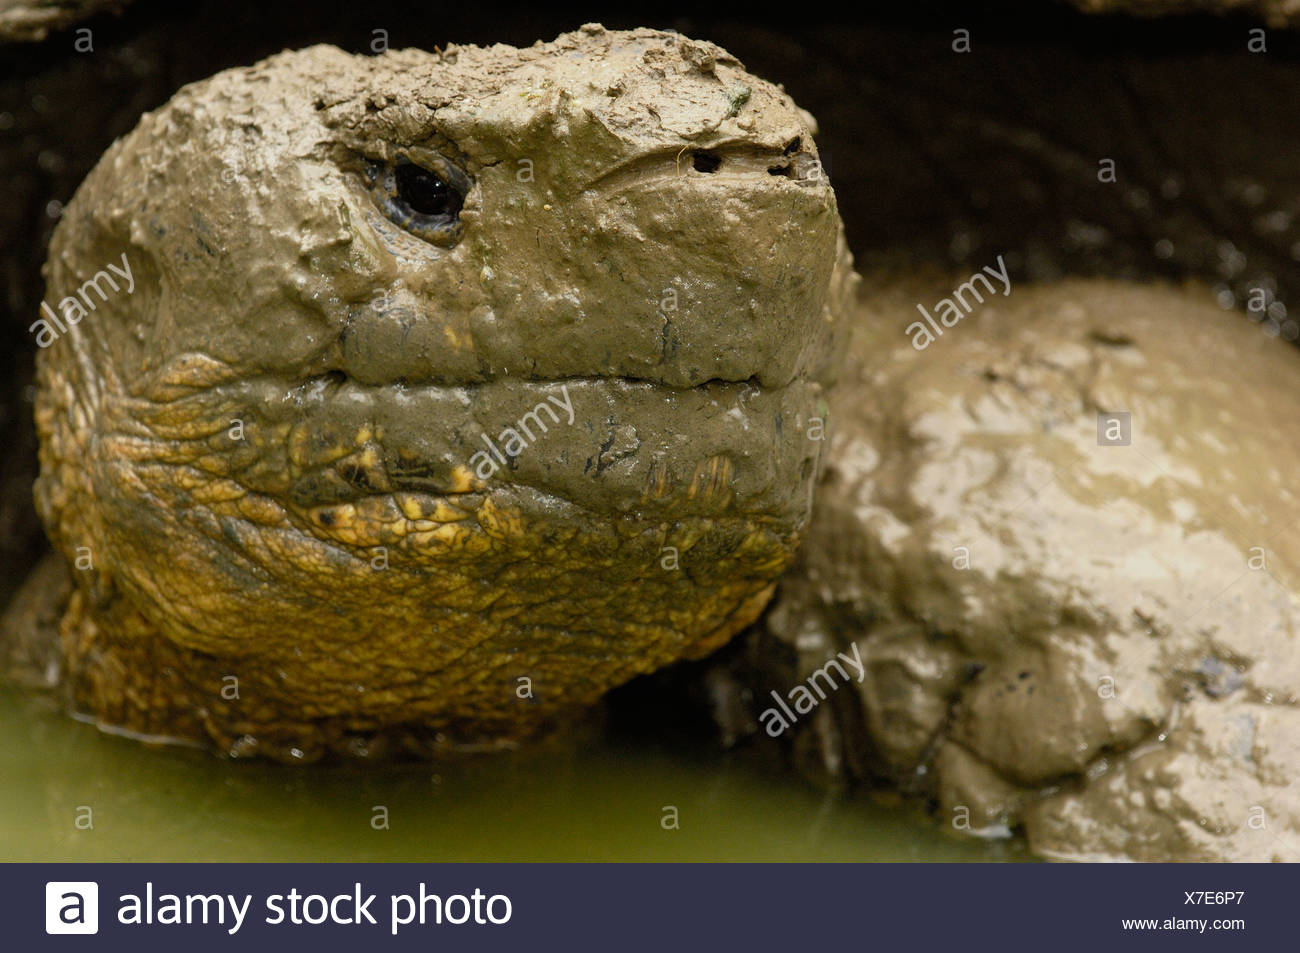 Galapagos Giant Tortoise wallowing in rain water pool, Highlands, Santa Cruz Island, Galapagos Islands, Ecuador, South America. - Stock Image